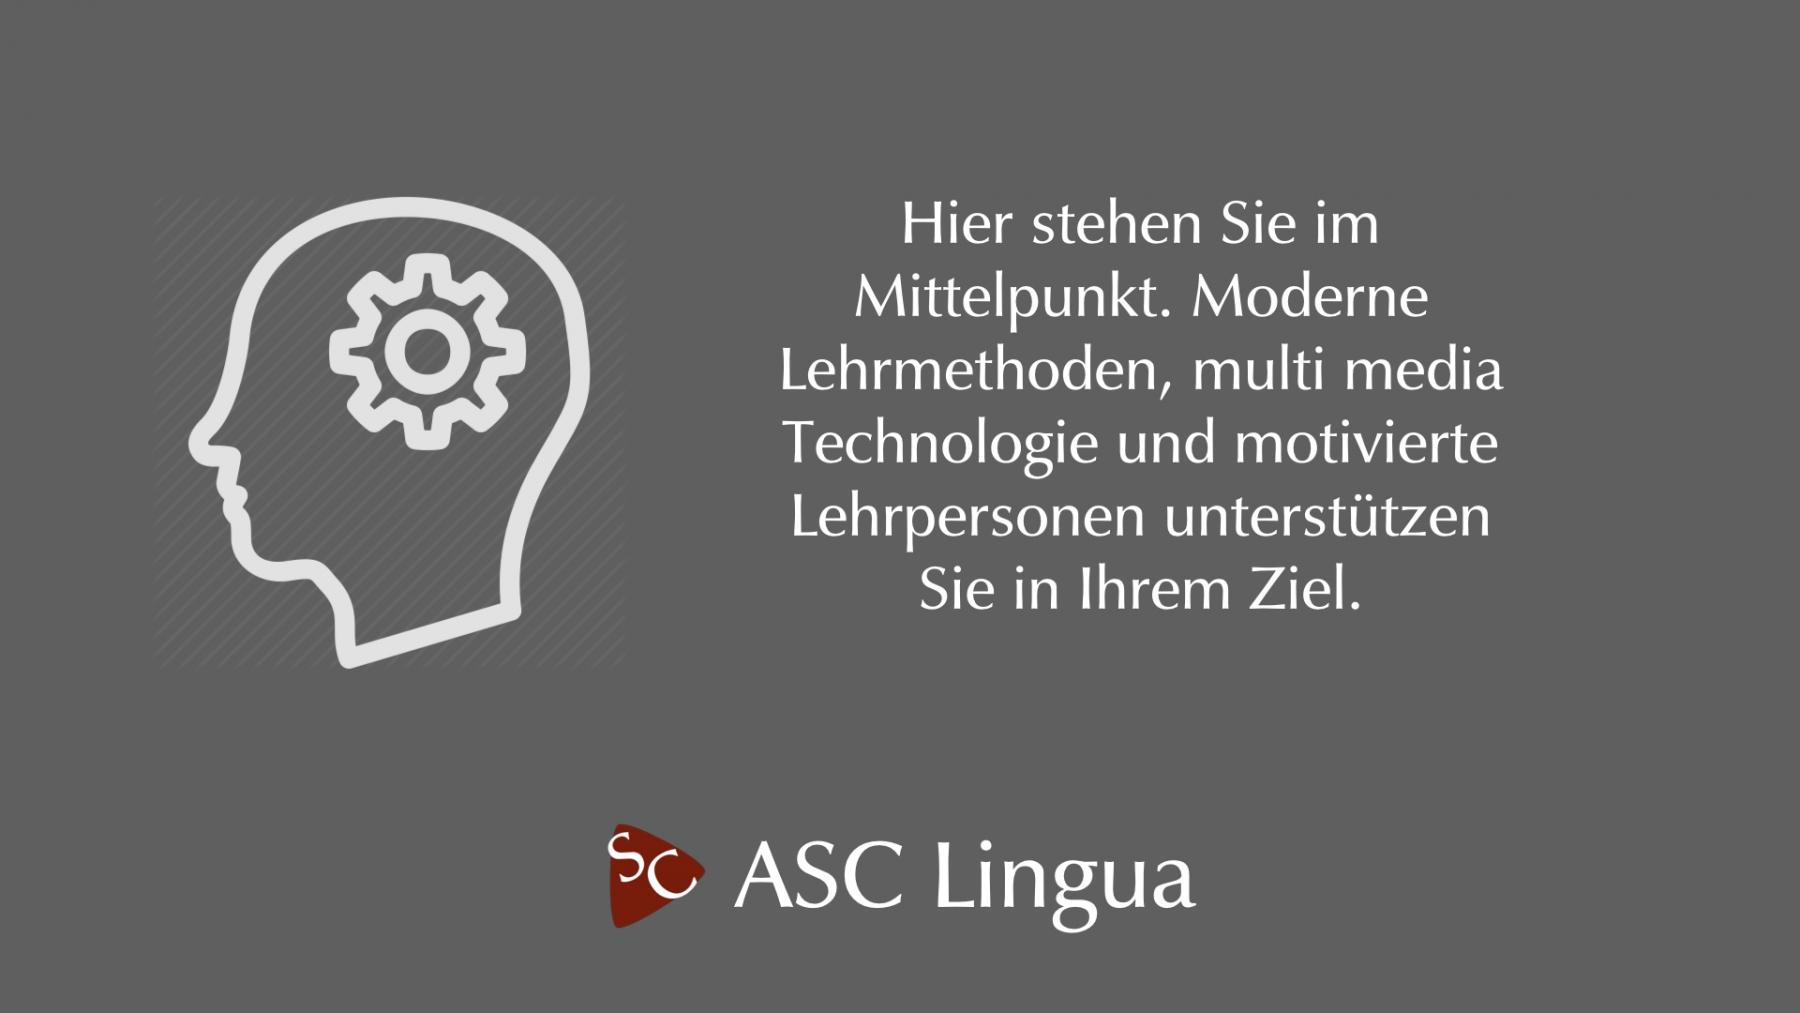 ASCL presentation stuff 30122018.006